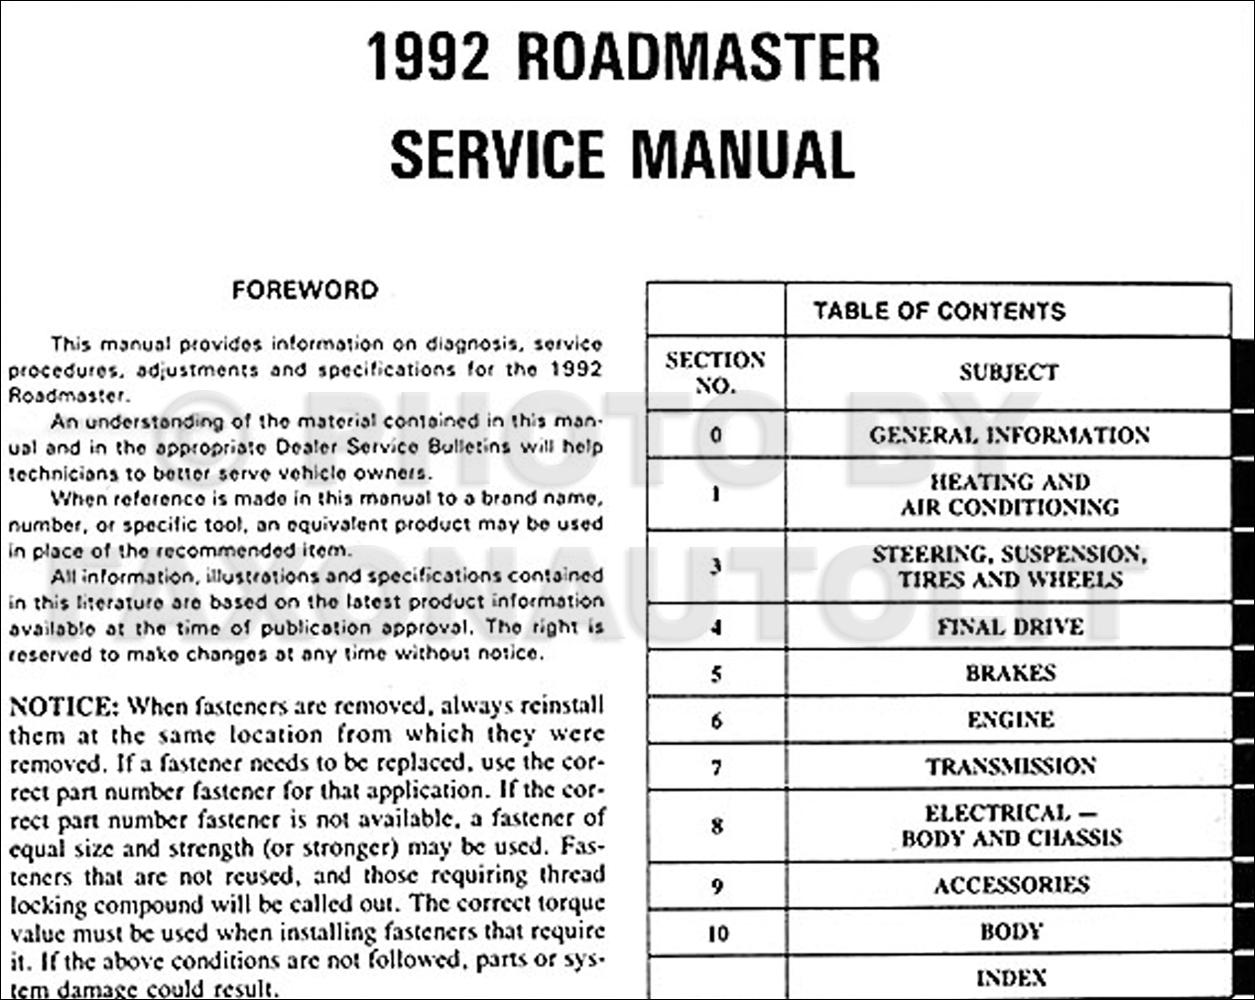 1991 Buick Roadmaster Wiring Diagram